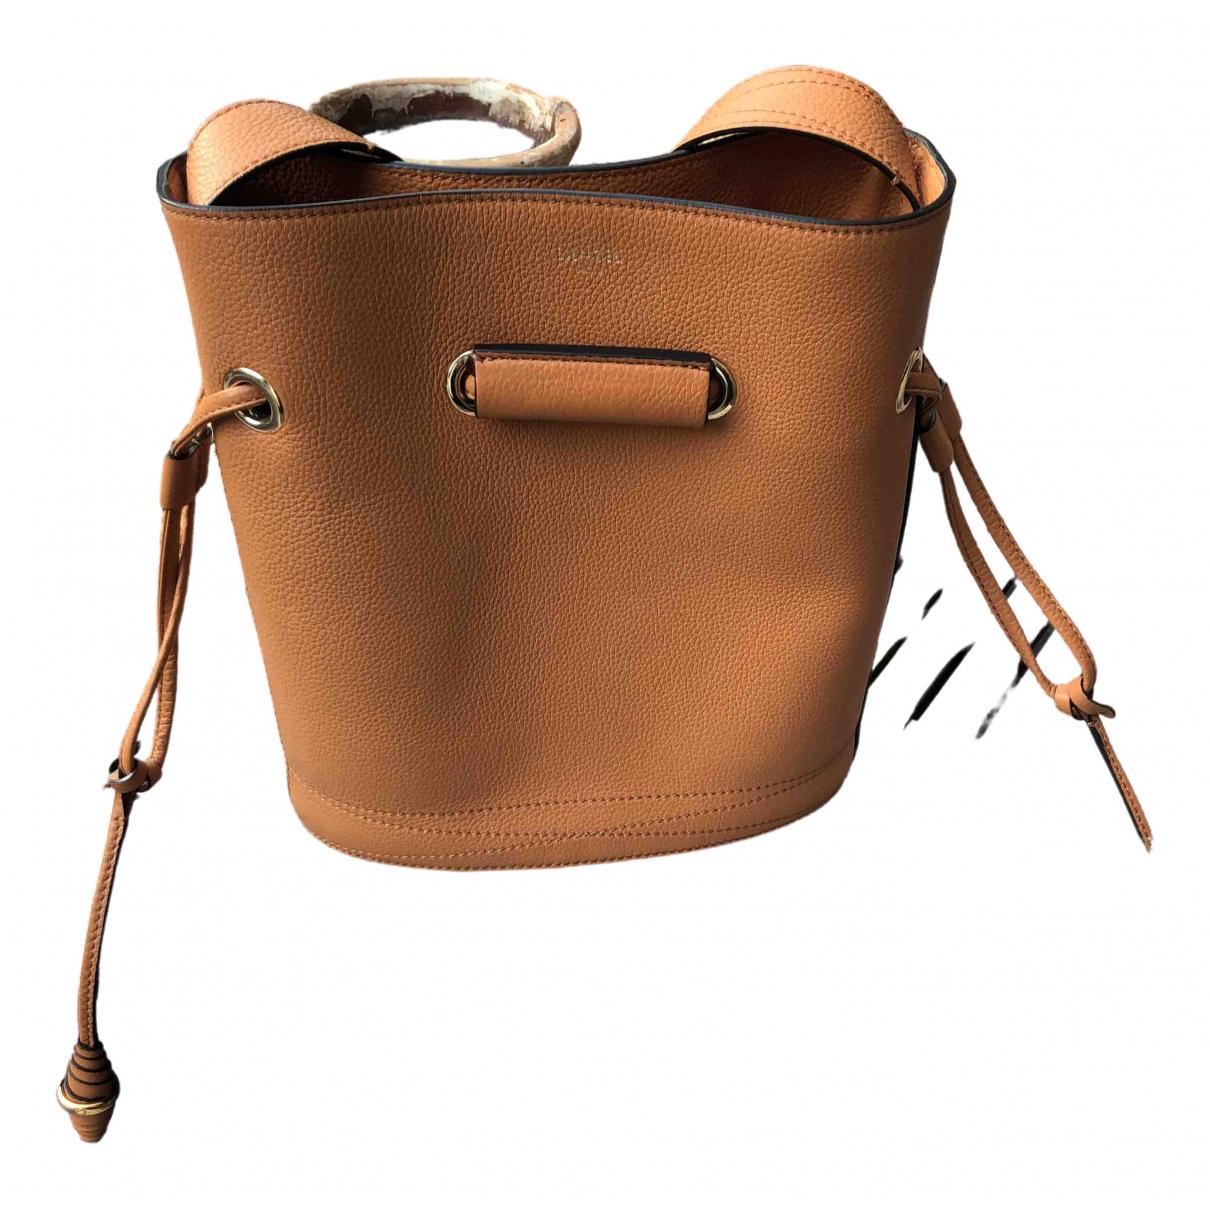 Lancel \N Camel Leather handbag for Women \N